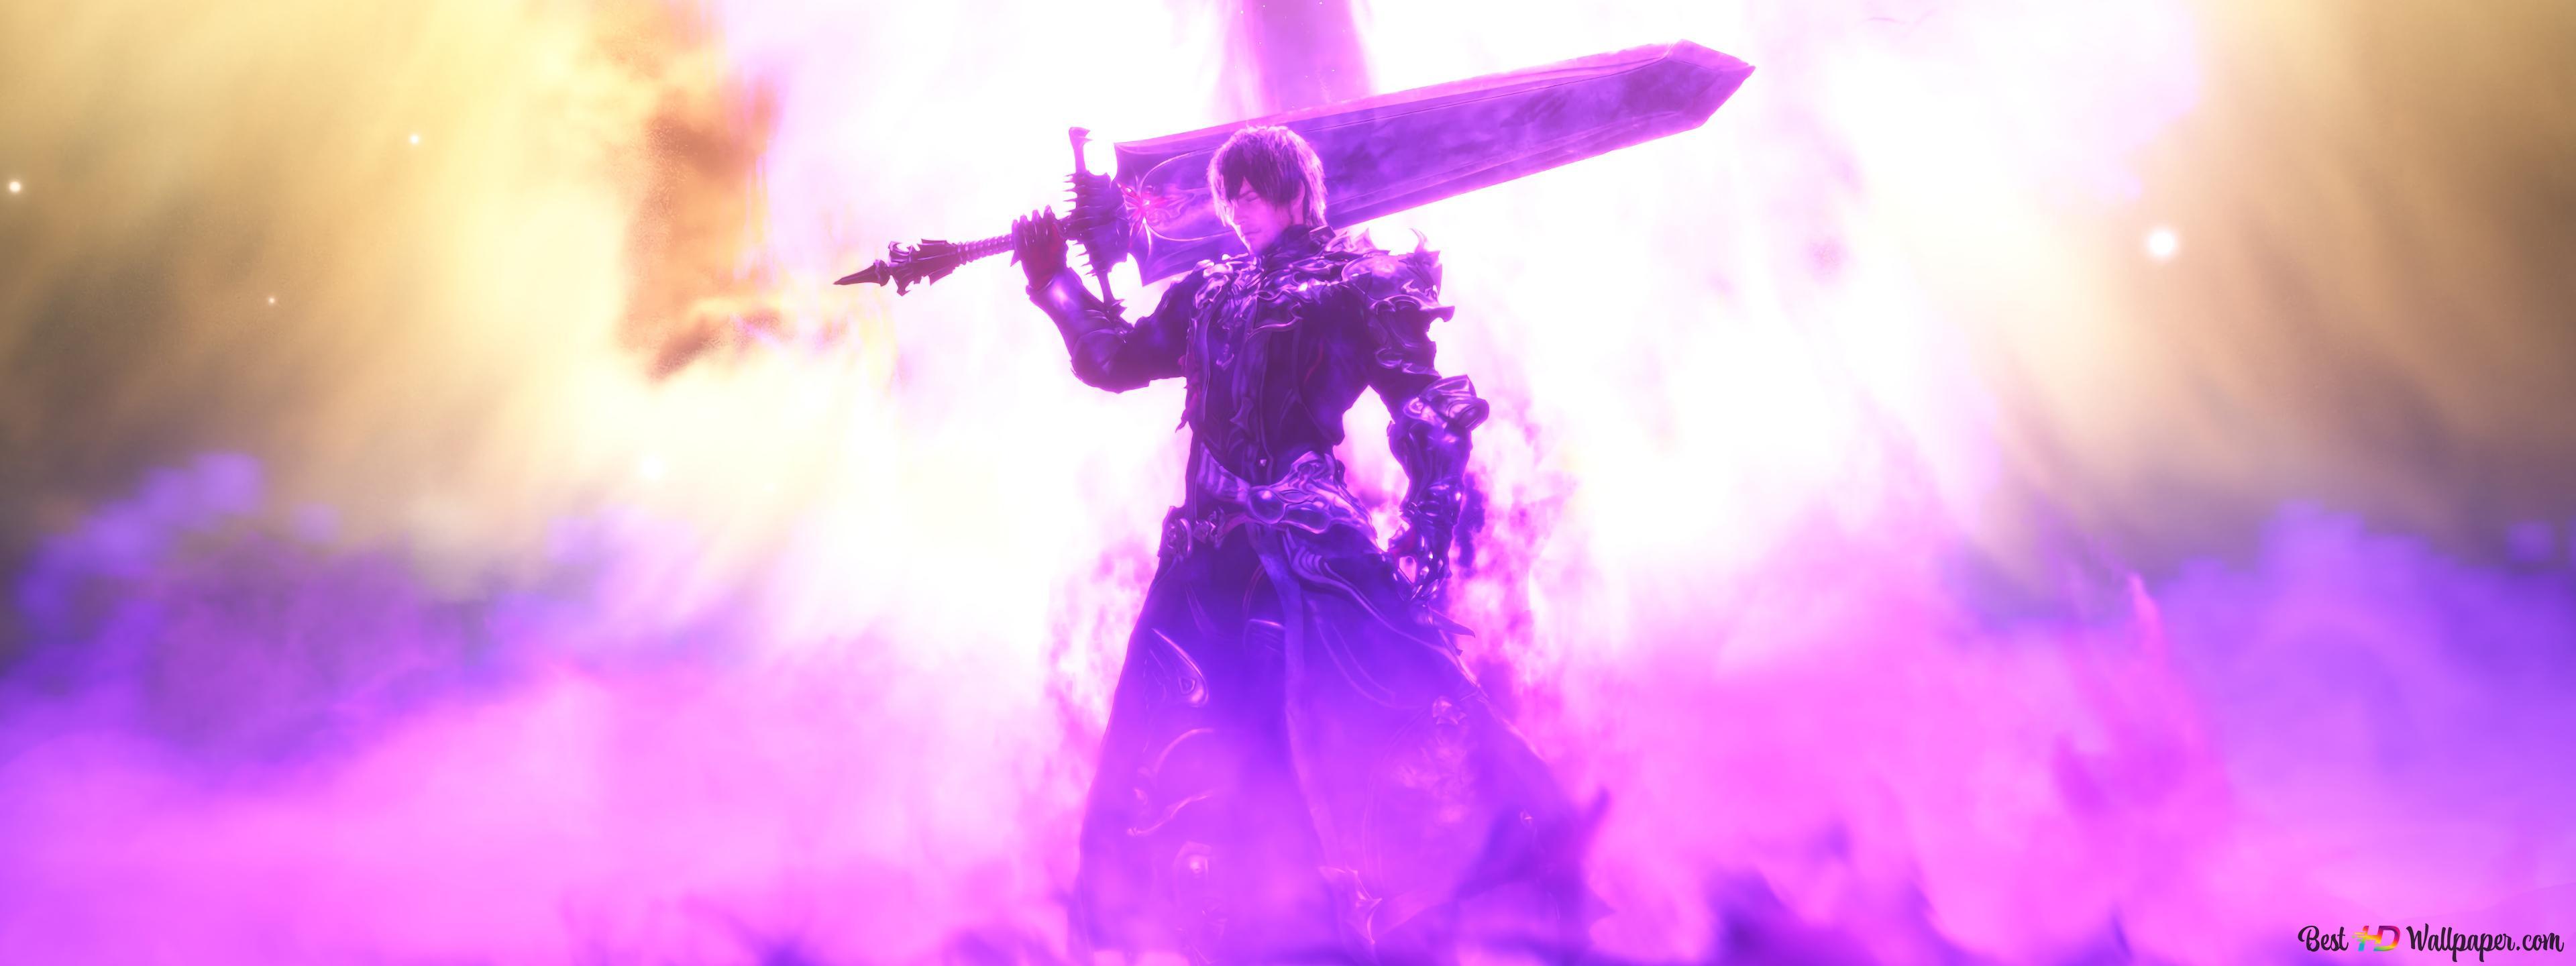 Final Fantasy Xiv Shadowbringers Hd Wallpaper Download